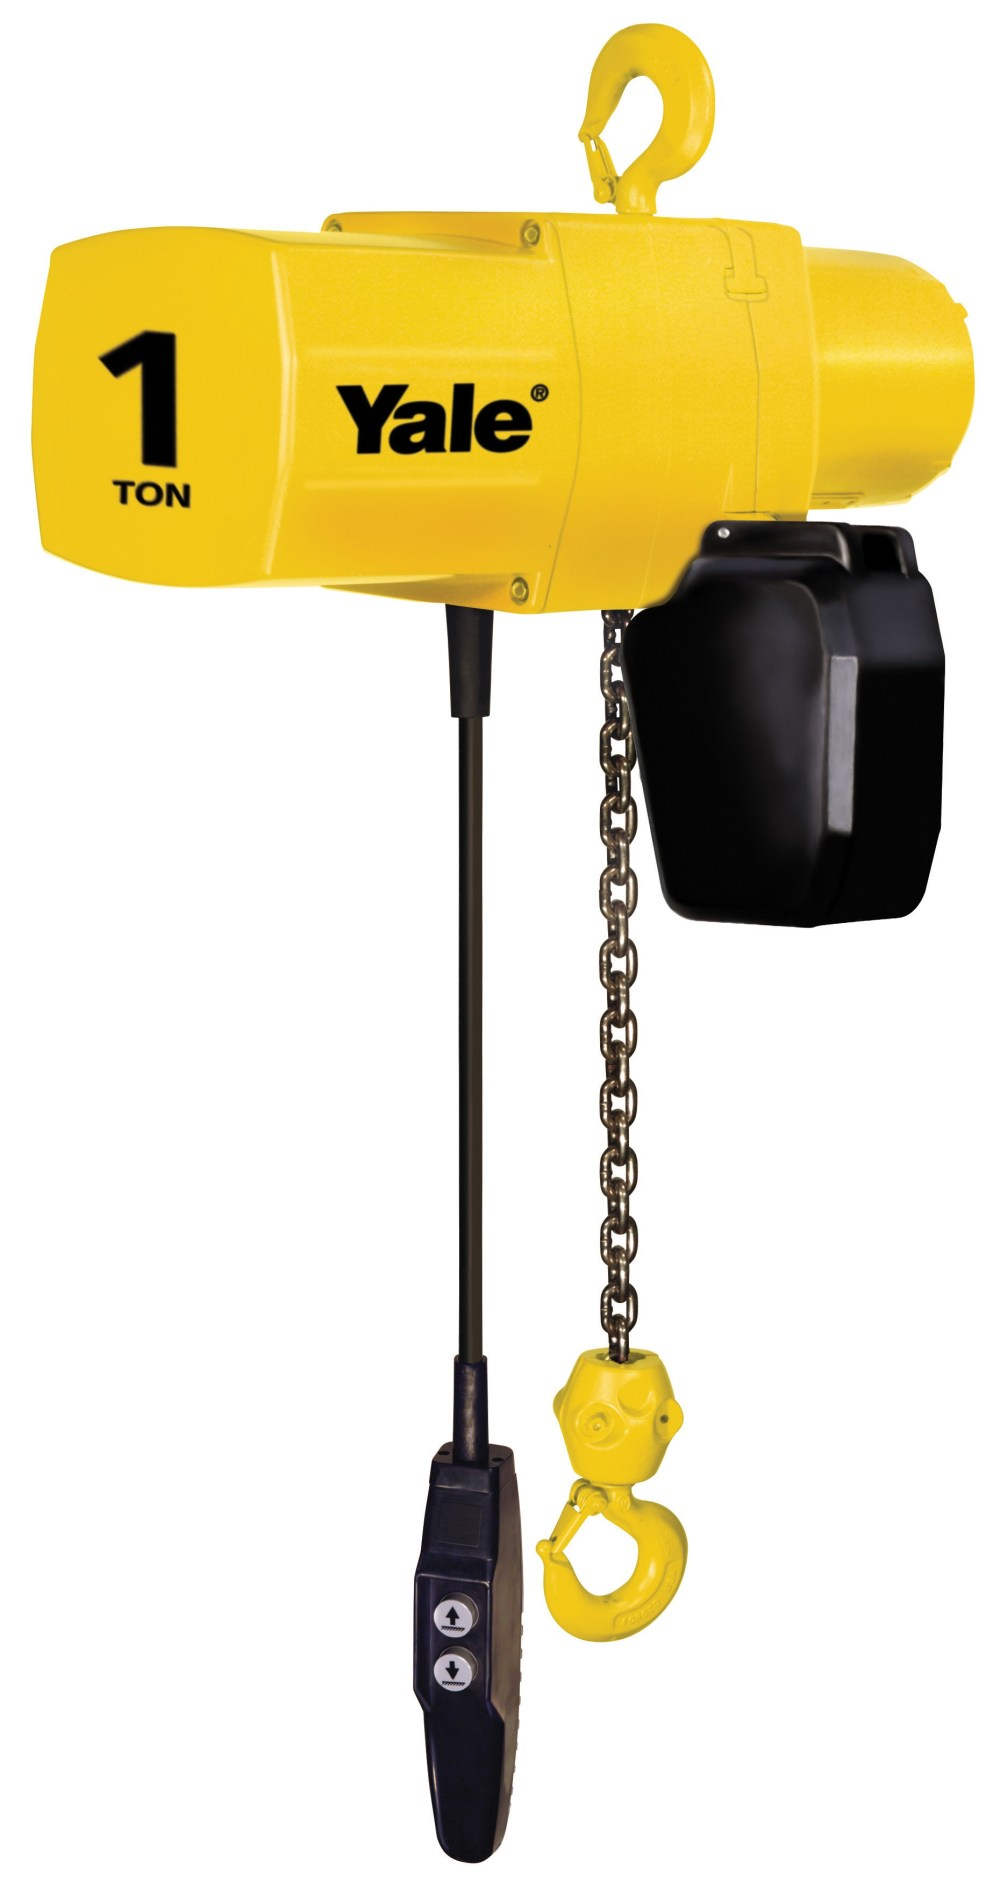 medium resolution of yale yjl electric chain hoist 1 2 ton yale yjl 3 ton yale hoist wiring diagram for